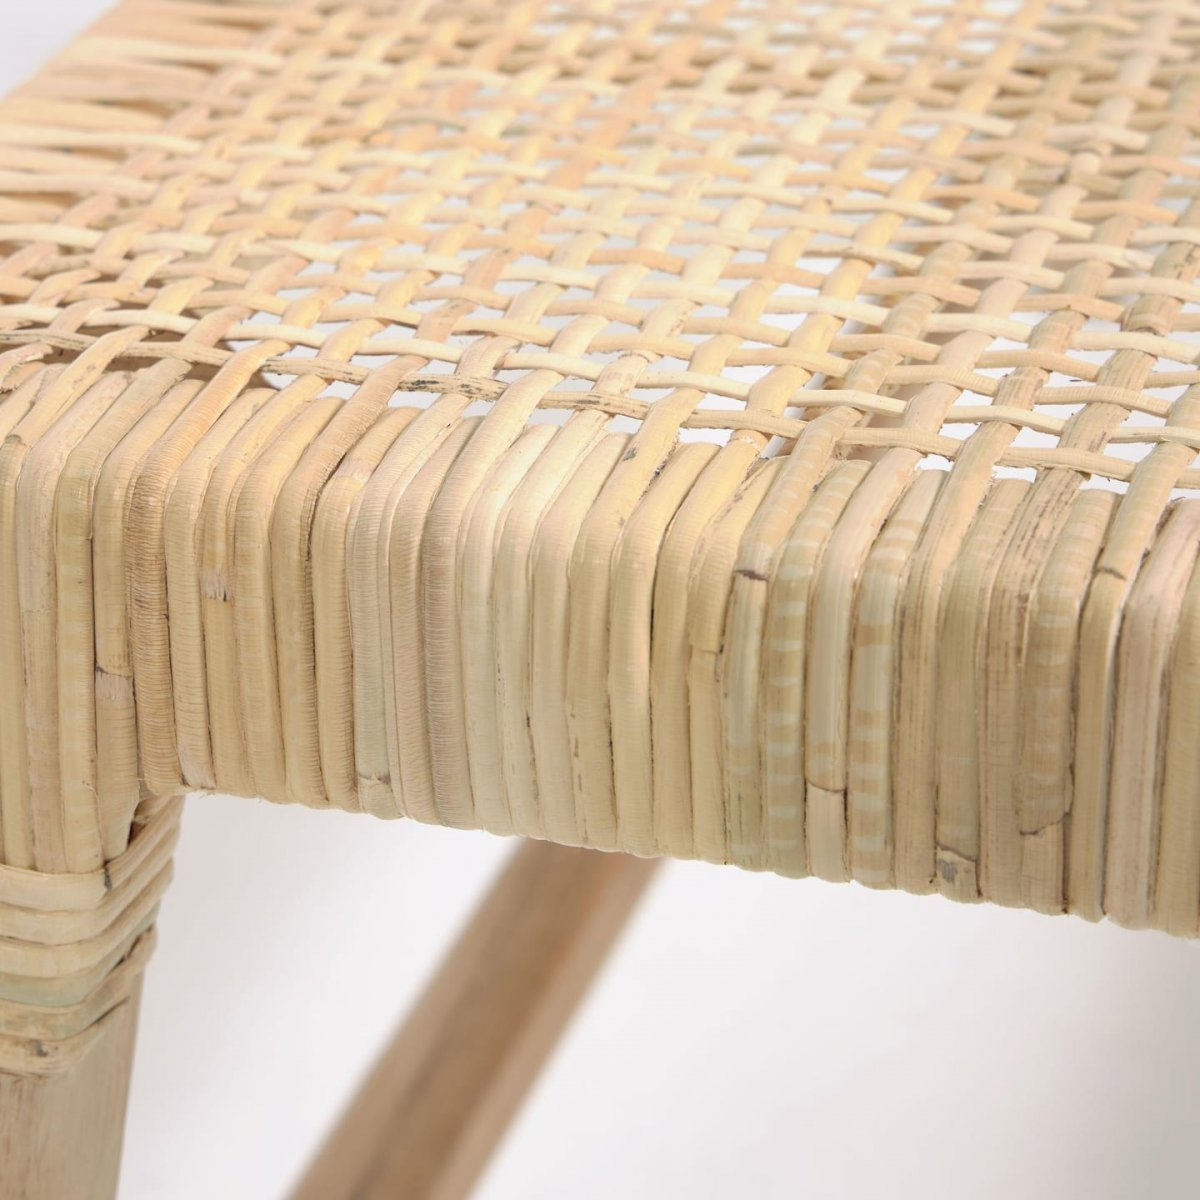 Keihome Linea J Panca Beida in legno e rattan